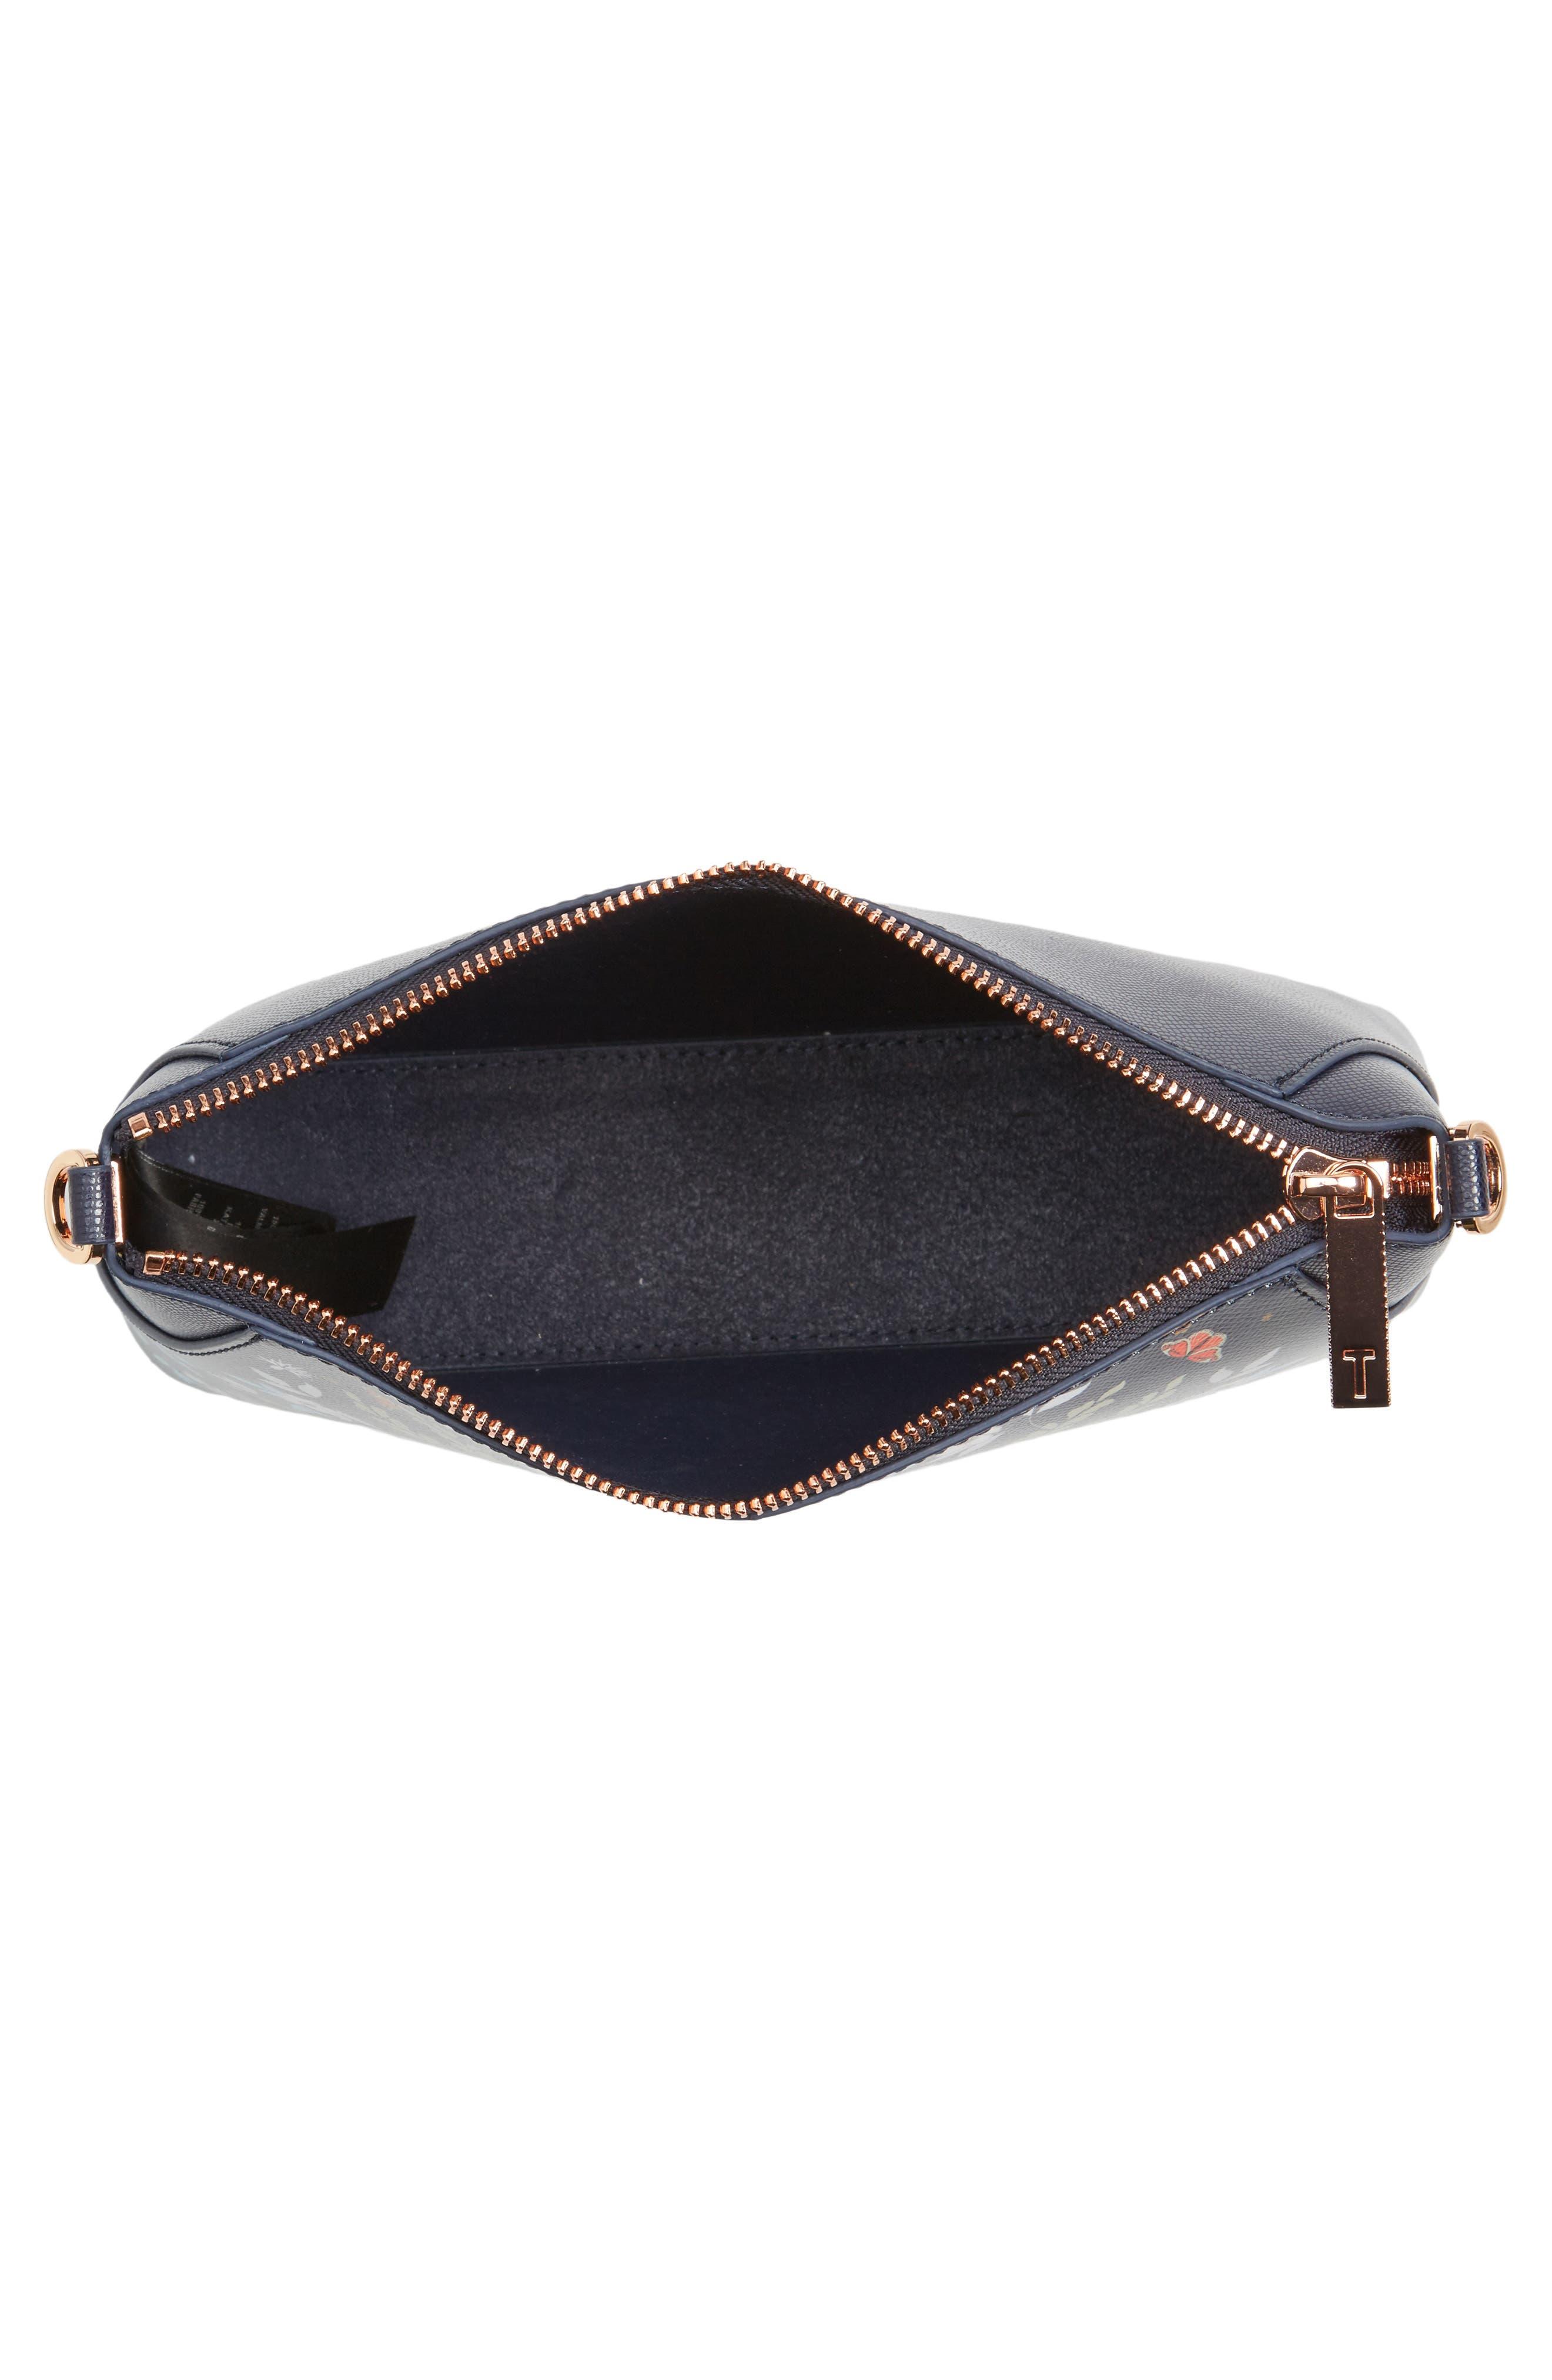 Marisiaa - Kyoto Gardens Leather Crossbody Bag,                             Alternate thumbnail 3, color,                             Mid Blue